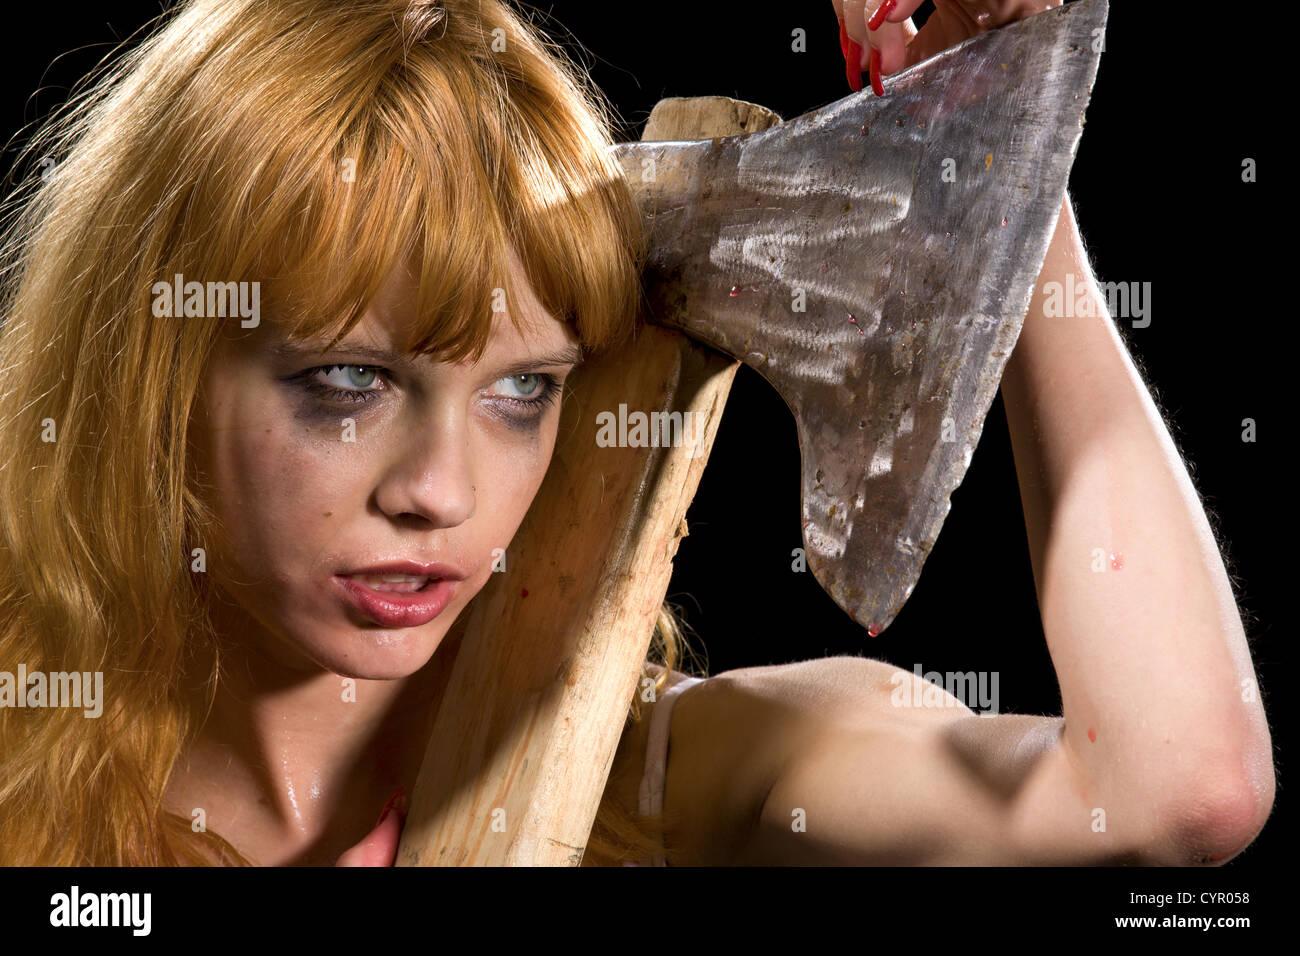 Redhead wild girl